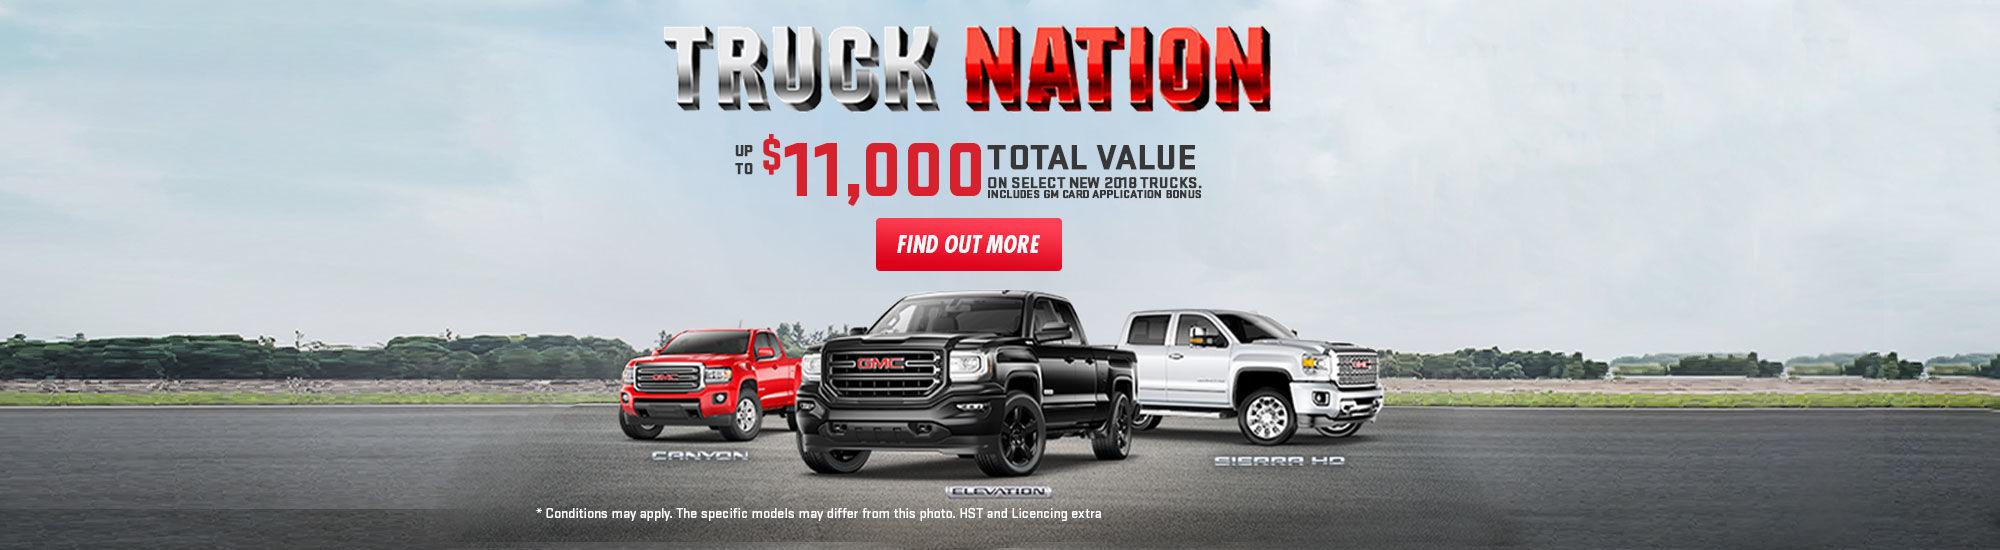 Truck Nation Sales Event - GMC web